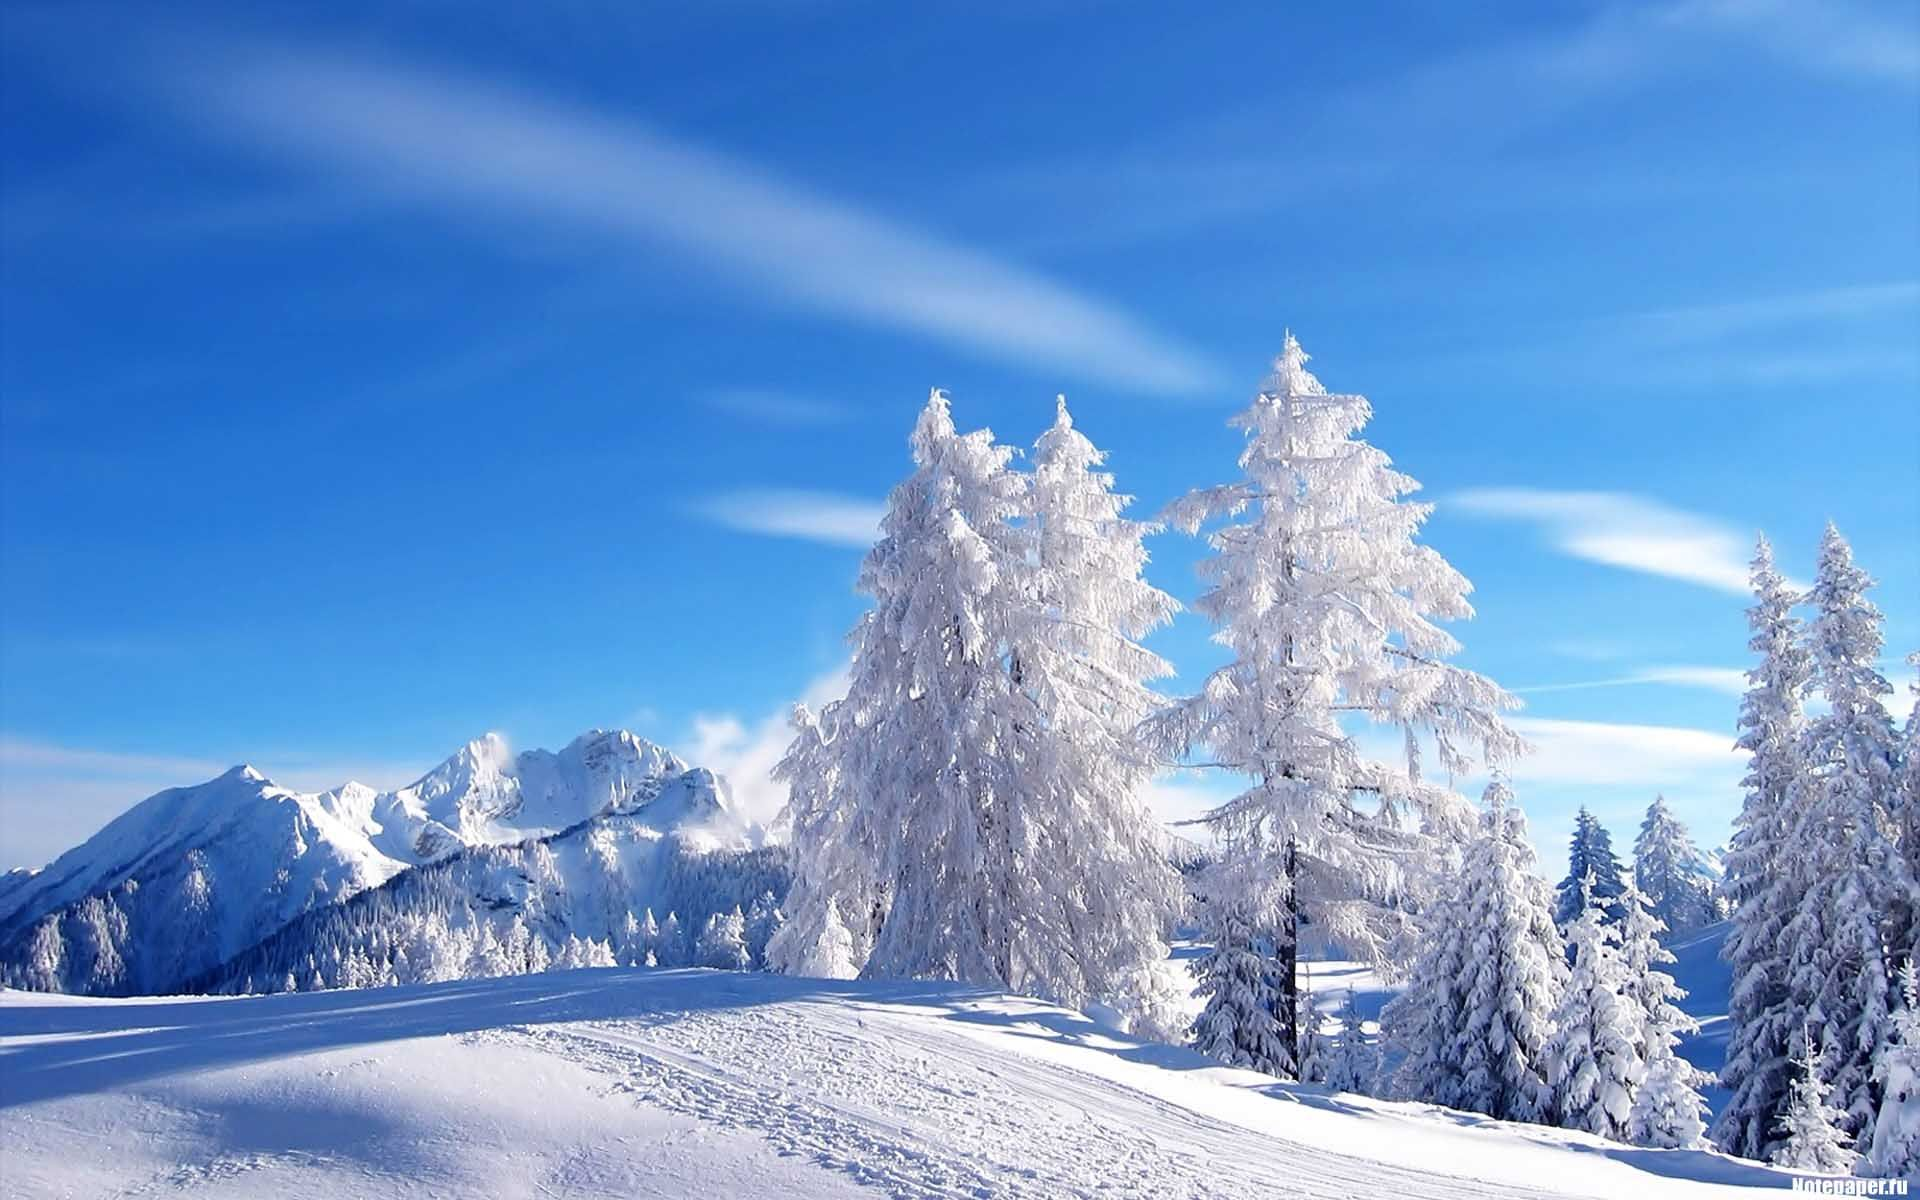 Snow Scenes Desktop Background Snow Scene Winter Landscape Winter Nature Winter Wallpaper